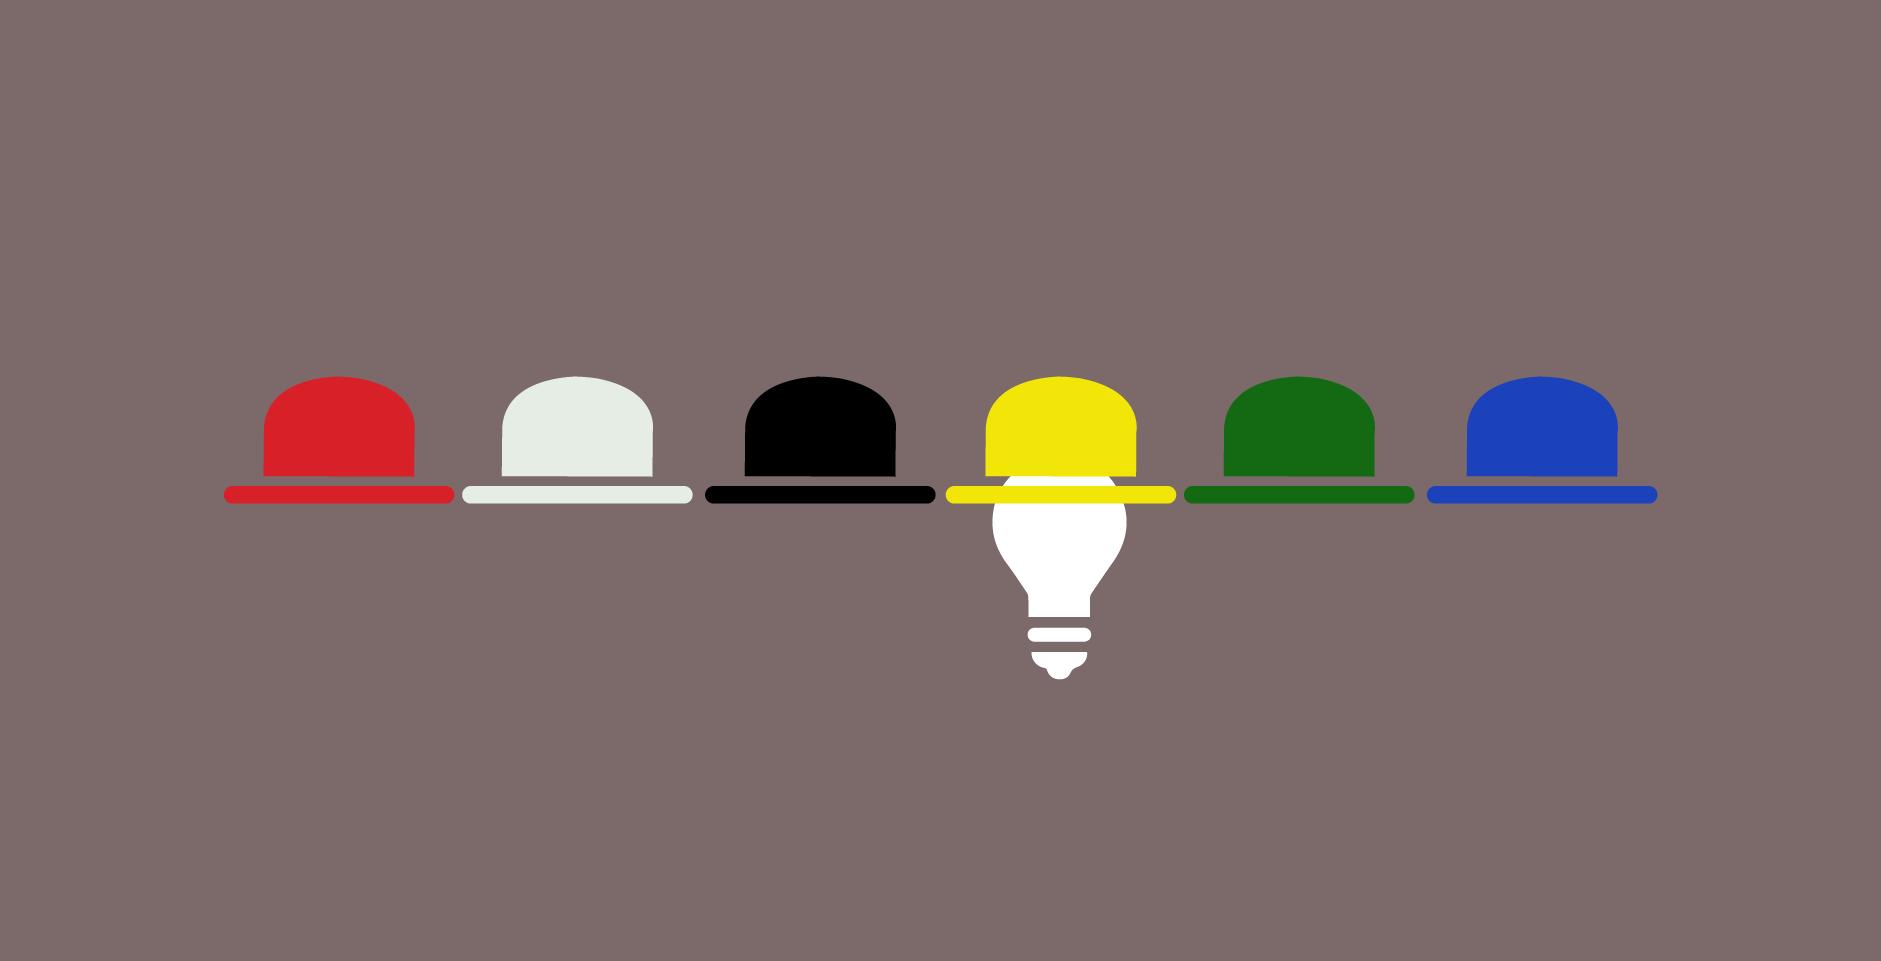 Innovation & Design thinking: Six Thinking Hats skills/tool